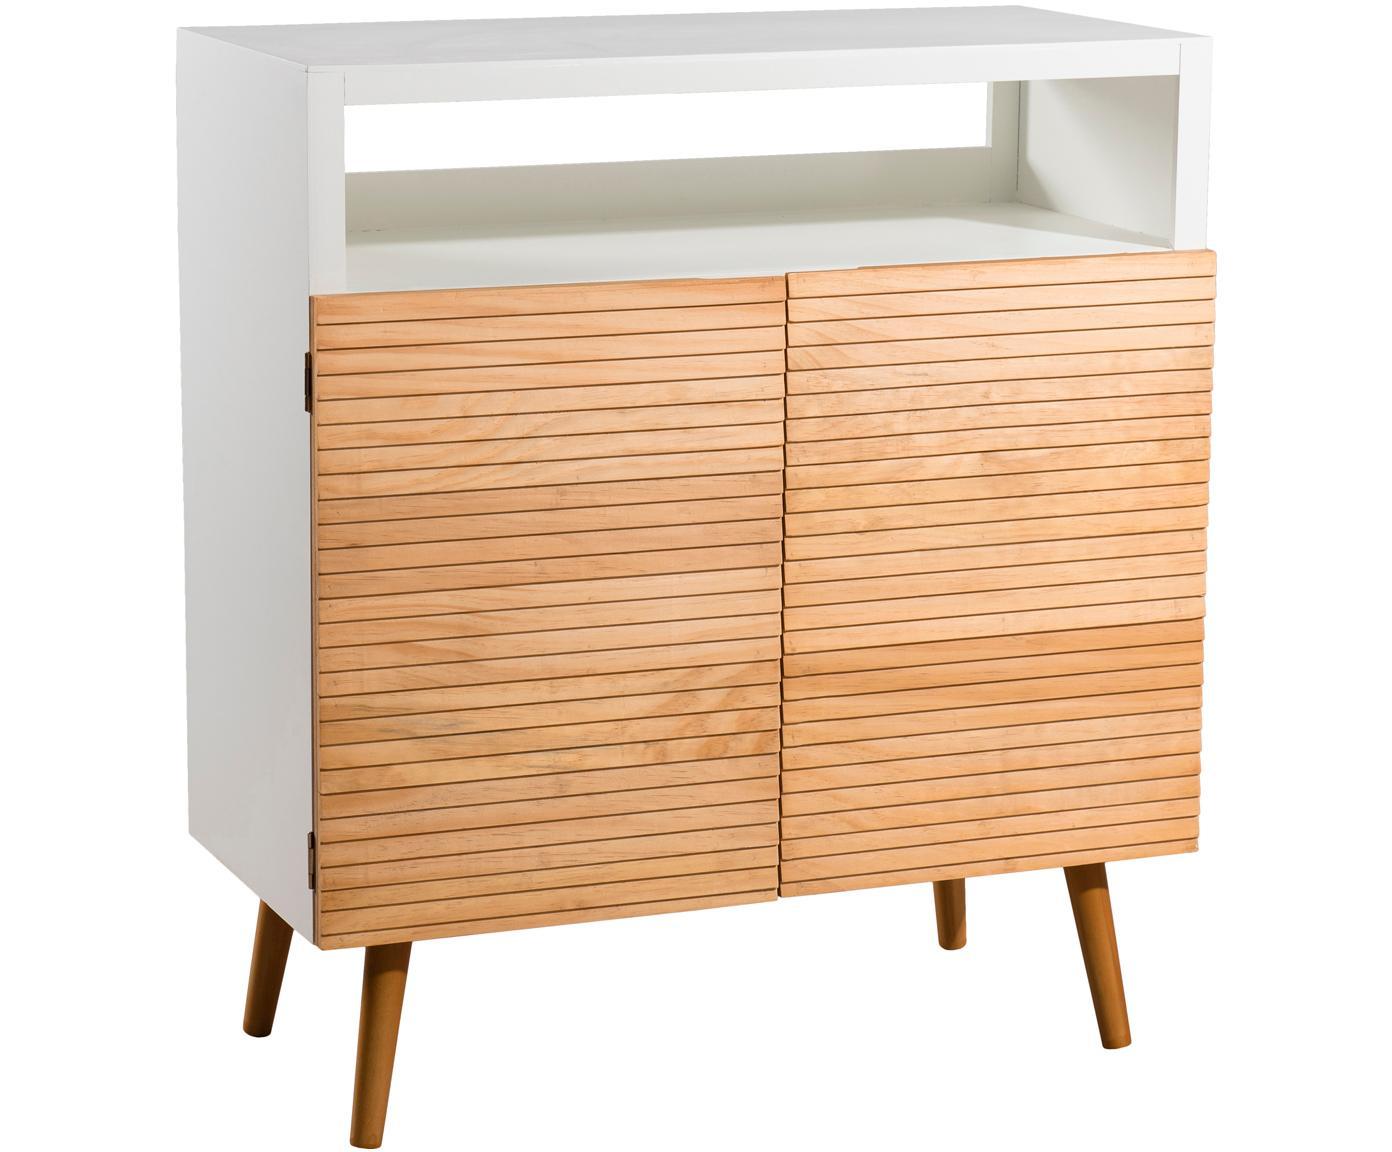 Aparador Pedro, estilo escandinavo, Estructura: tablero de fibras de dens, Blanco, madera de pino, An 80 x Al 89 cm